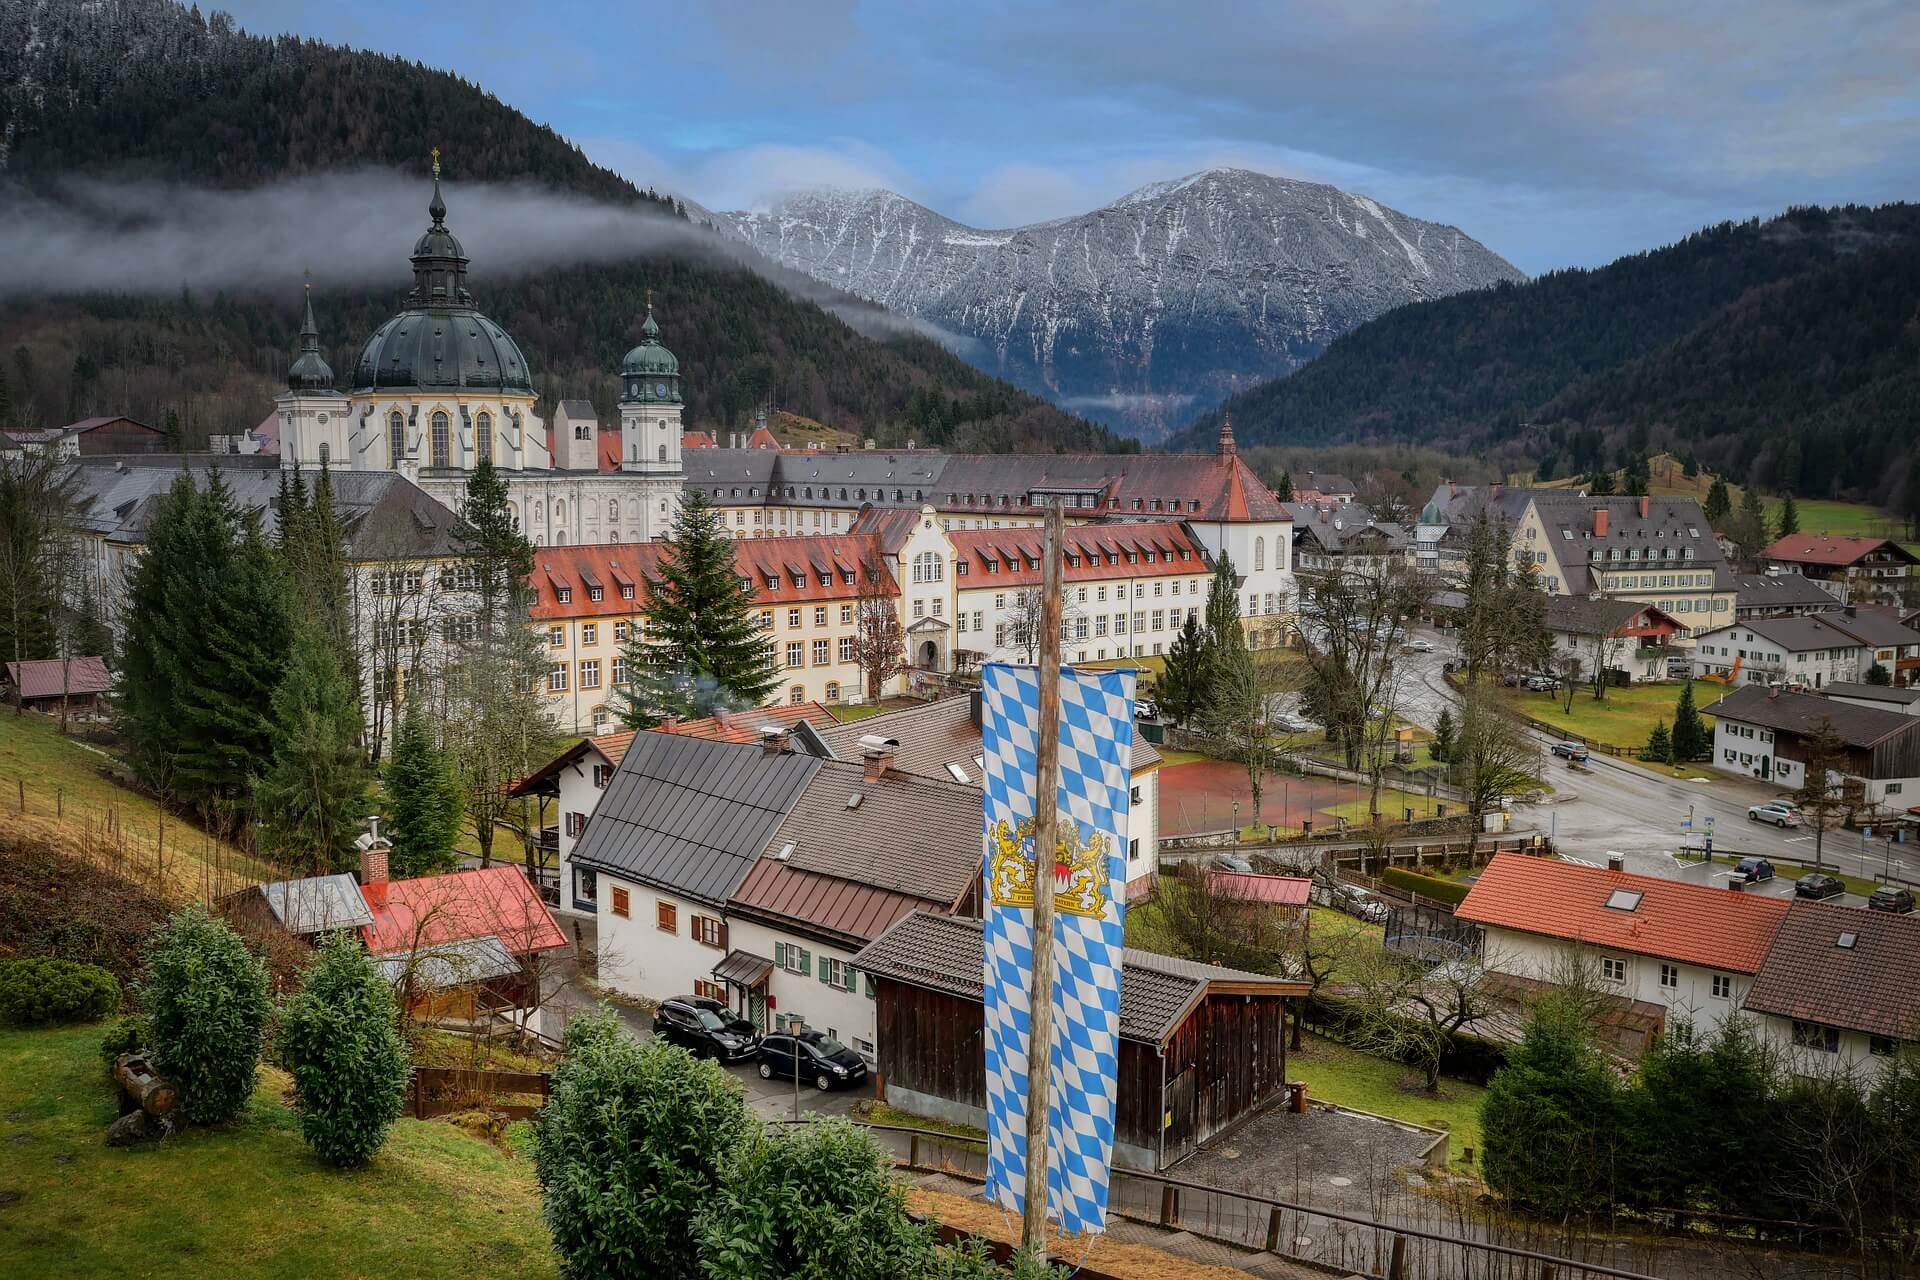 Klöster in Deutschland, Benediktinerklöster